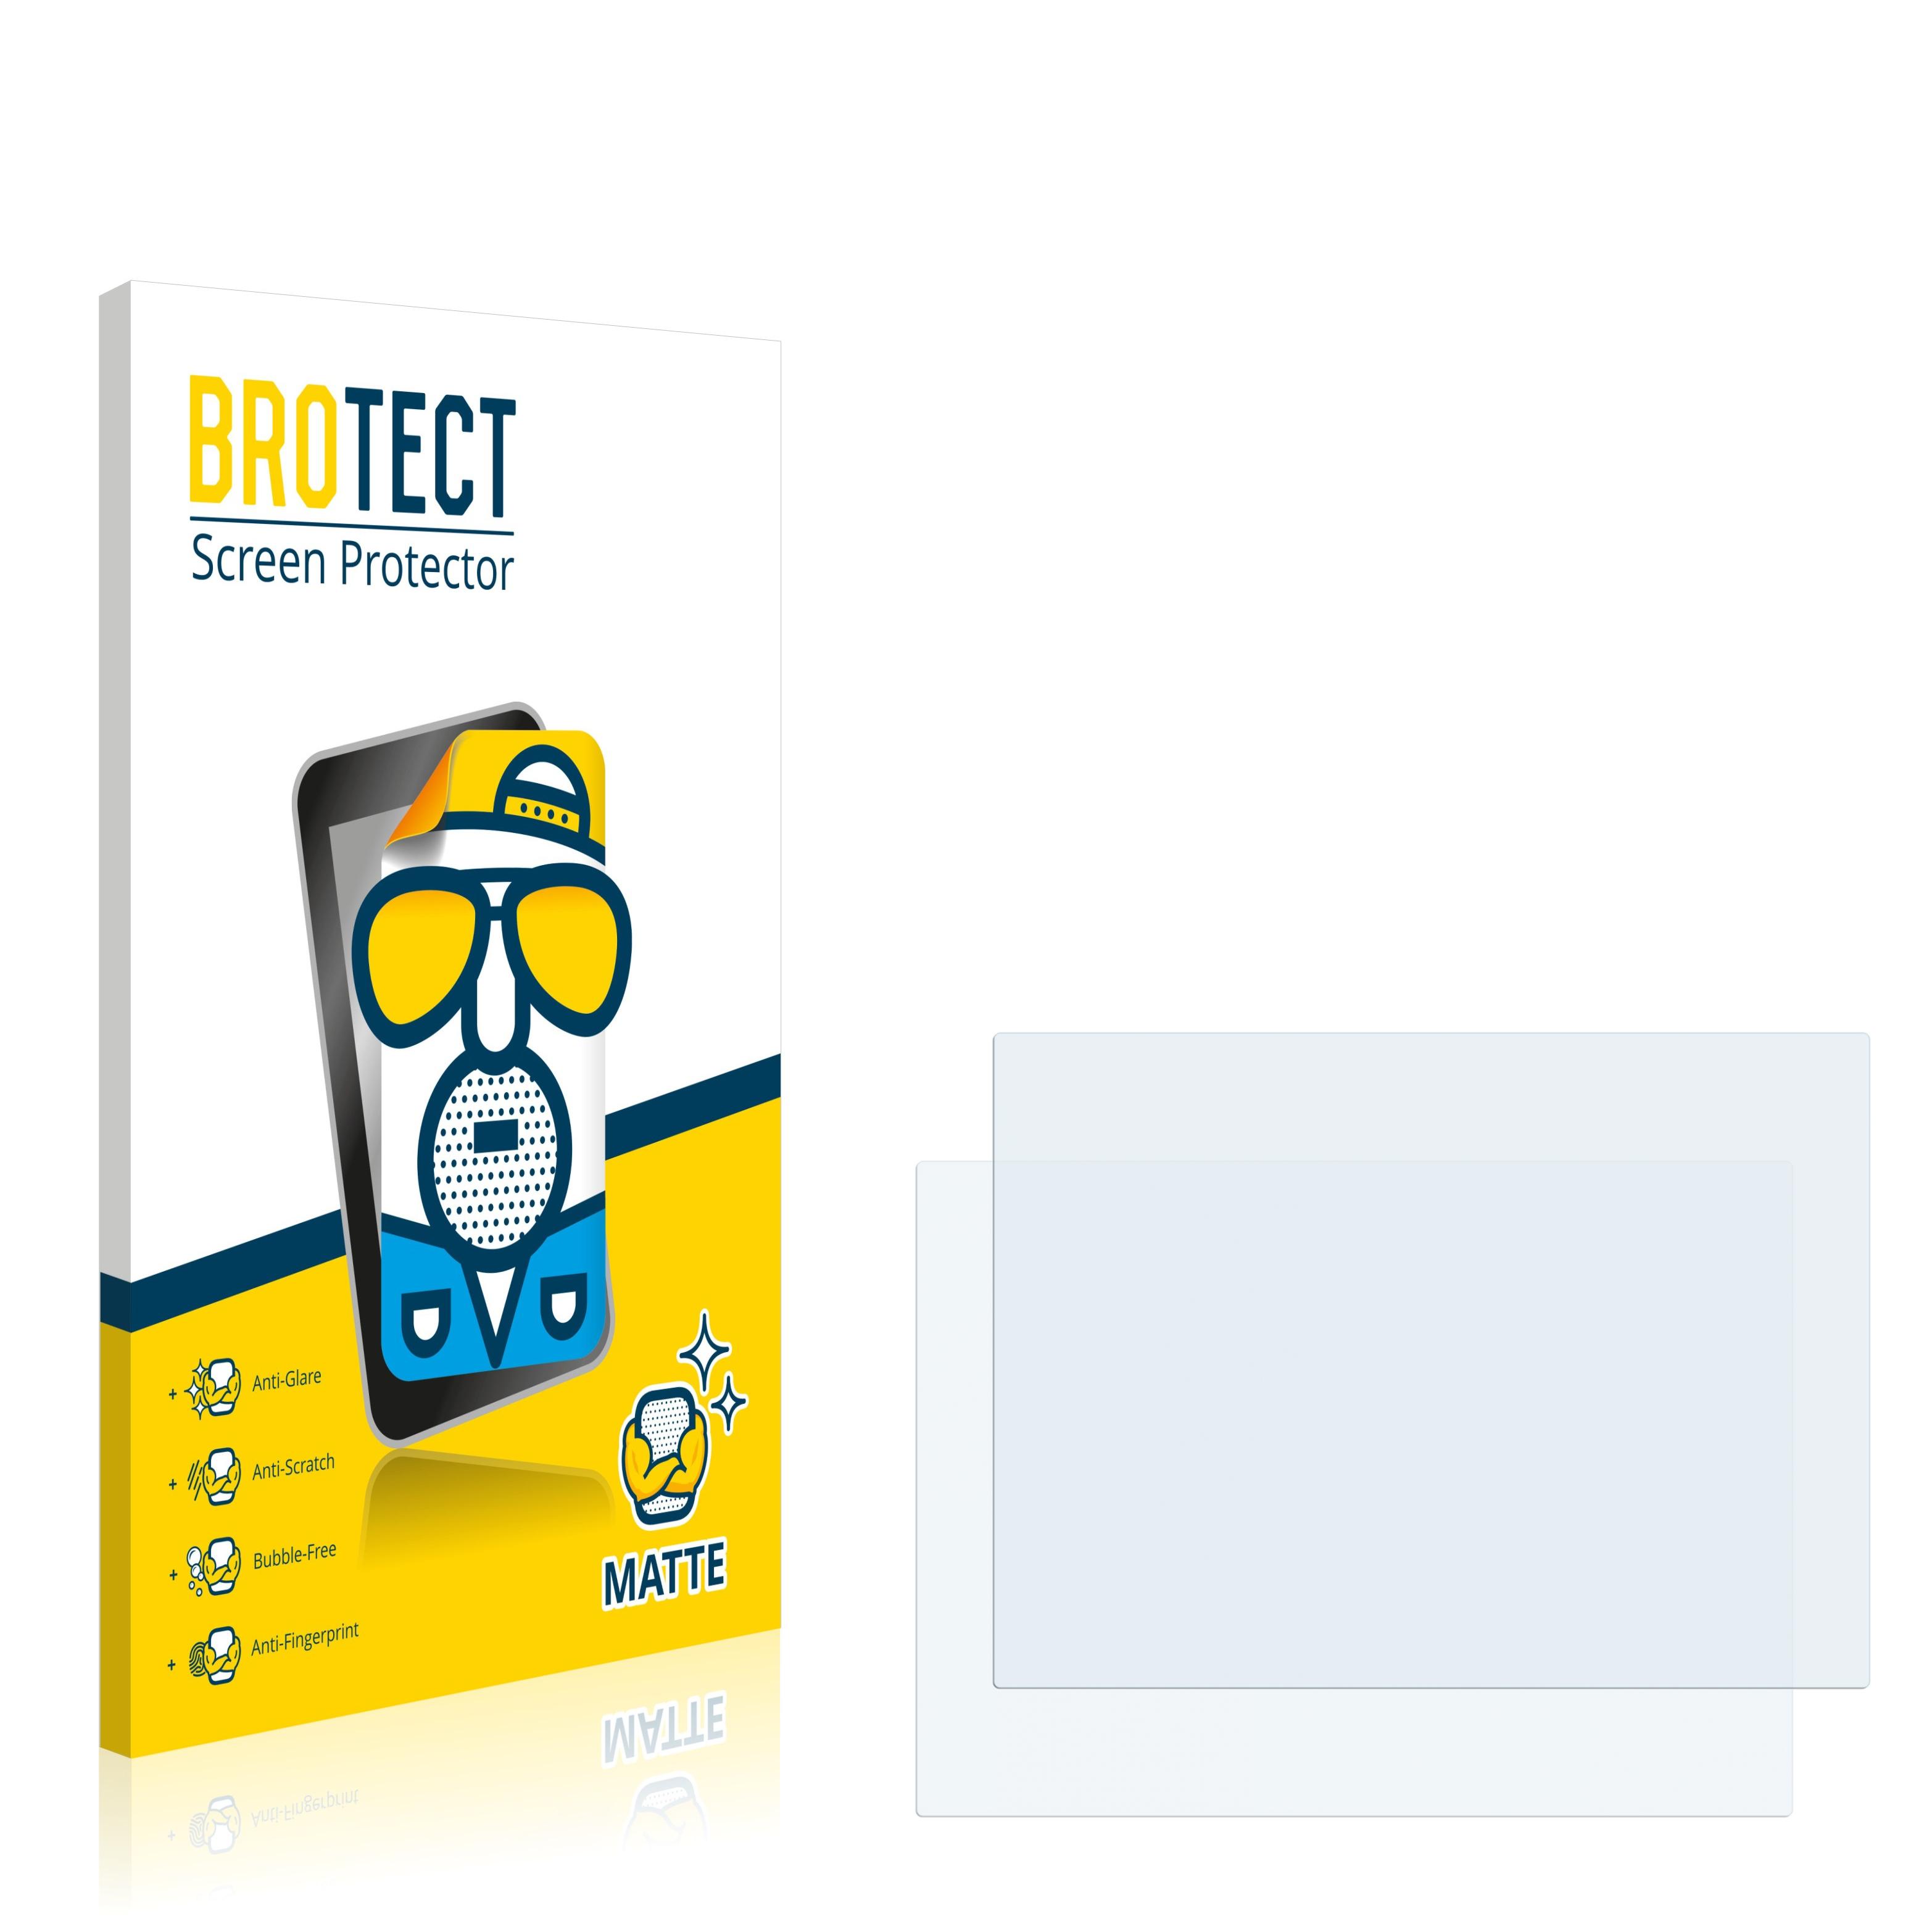 Matná ochranná fólie BROTECT pro Acer Travelmate 200 (13.3), 2 ks